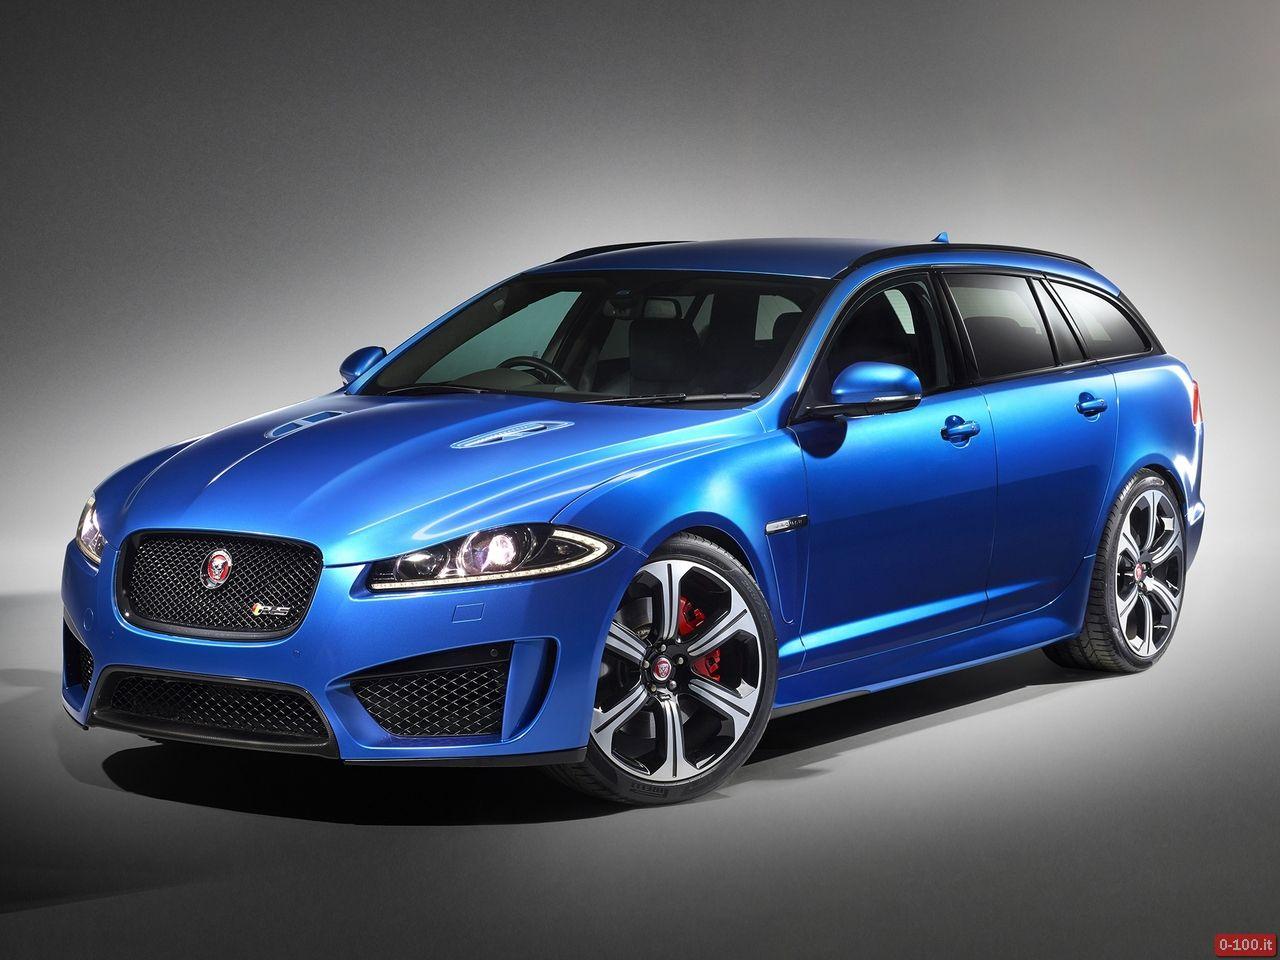 ginevra-2014-jaguar-xf-model-year-2015-xfr-s-sportbrake-0-100_5